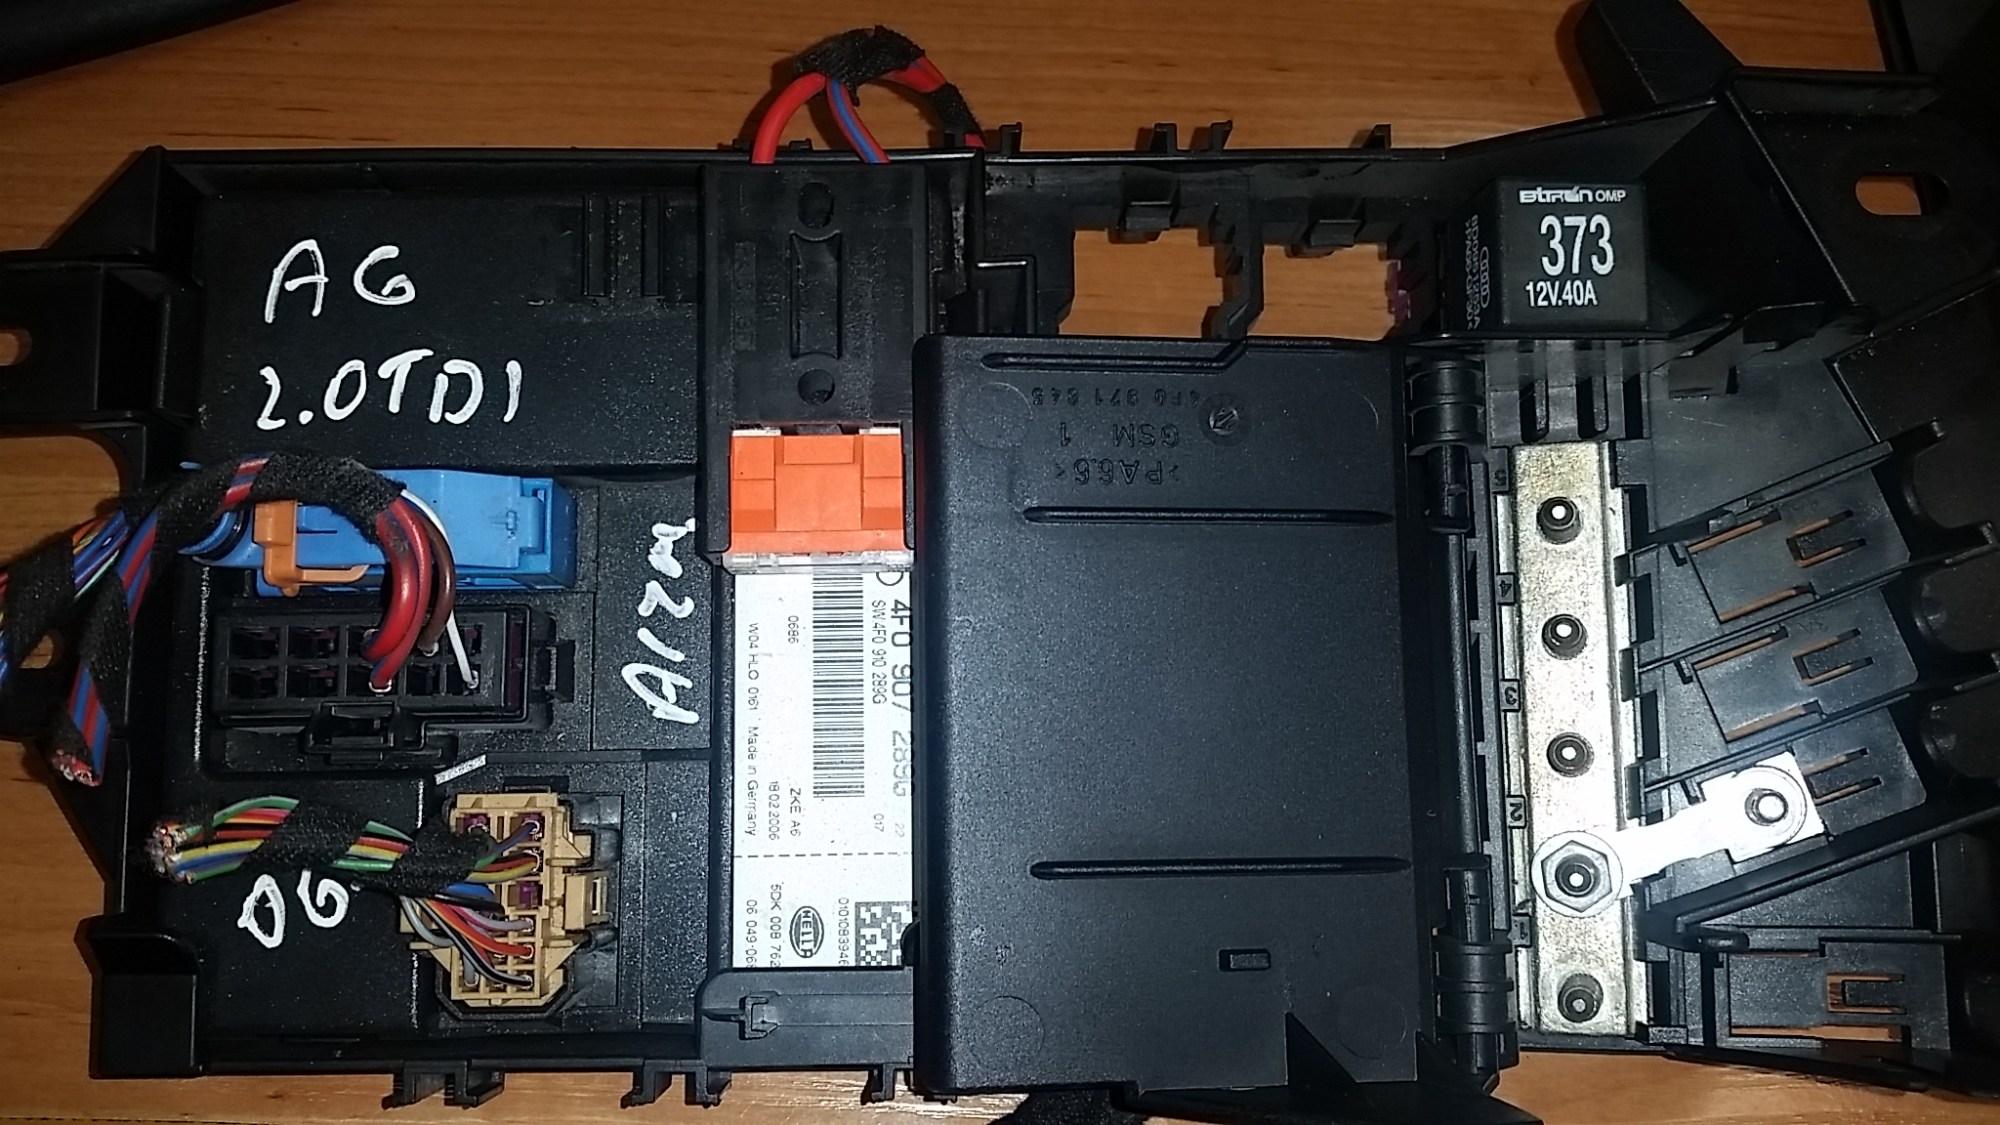 hight resolution of audi a6 c6 2006 2 0 tdi fuse box and comfort module ecu hella article 4f0907289g 4f0 907 289 g